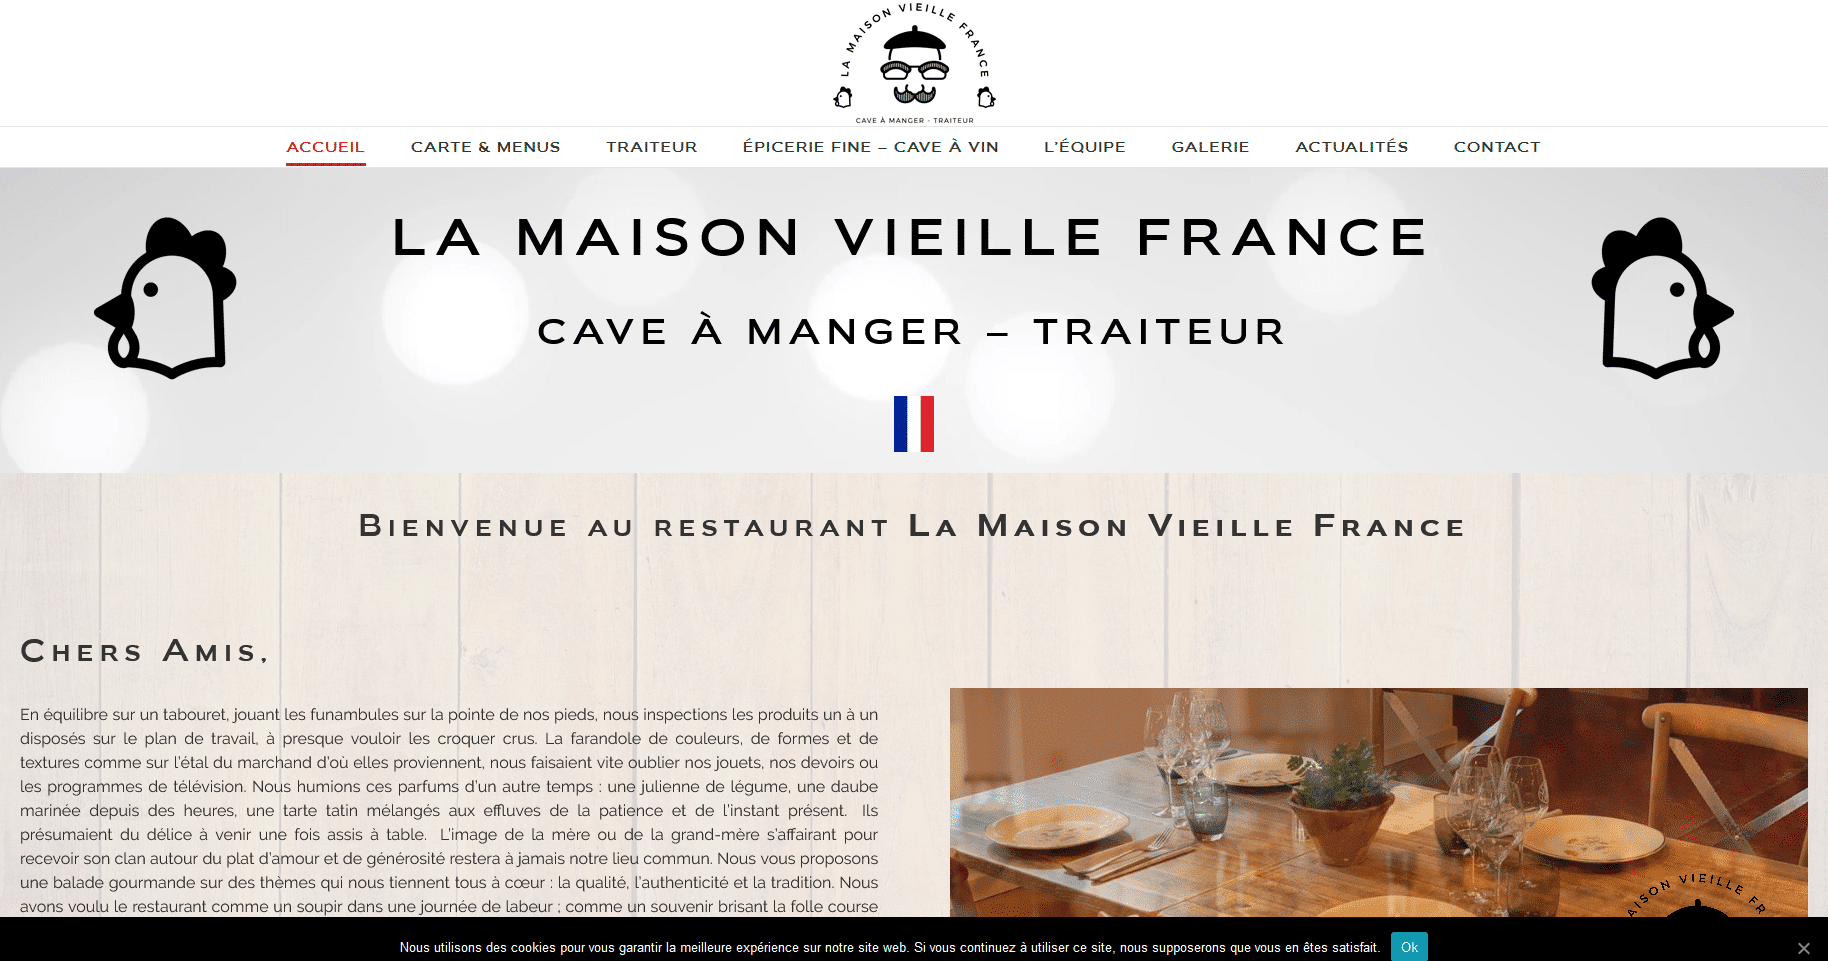 Restaurant Maison Vieille France